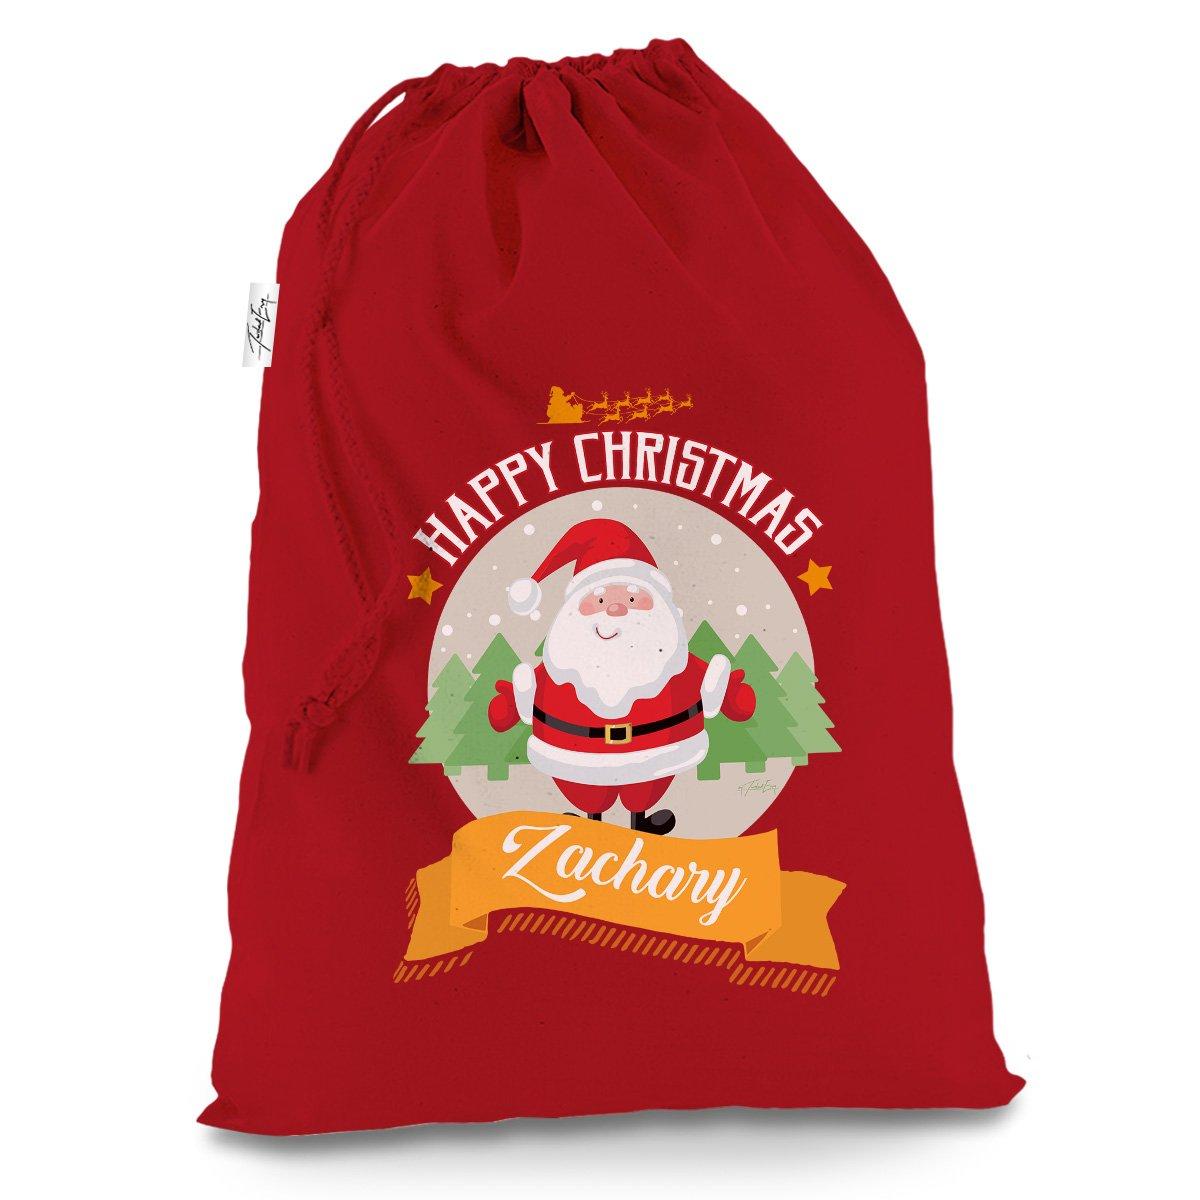 Personalised Merry Christmas From Santa Large Red Christmas Present Santa Sack Mail Post Bag